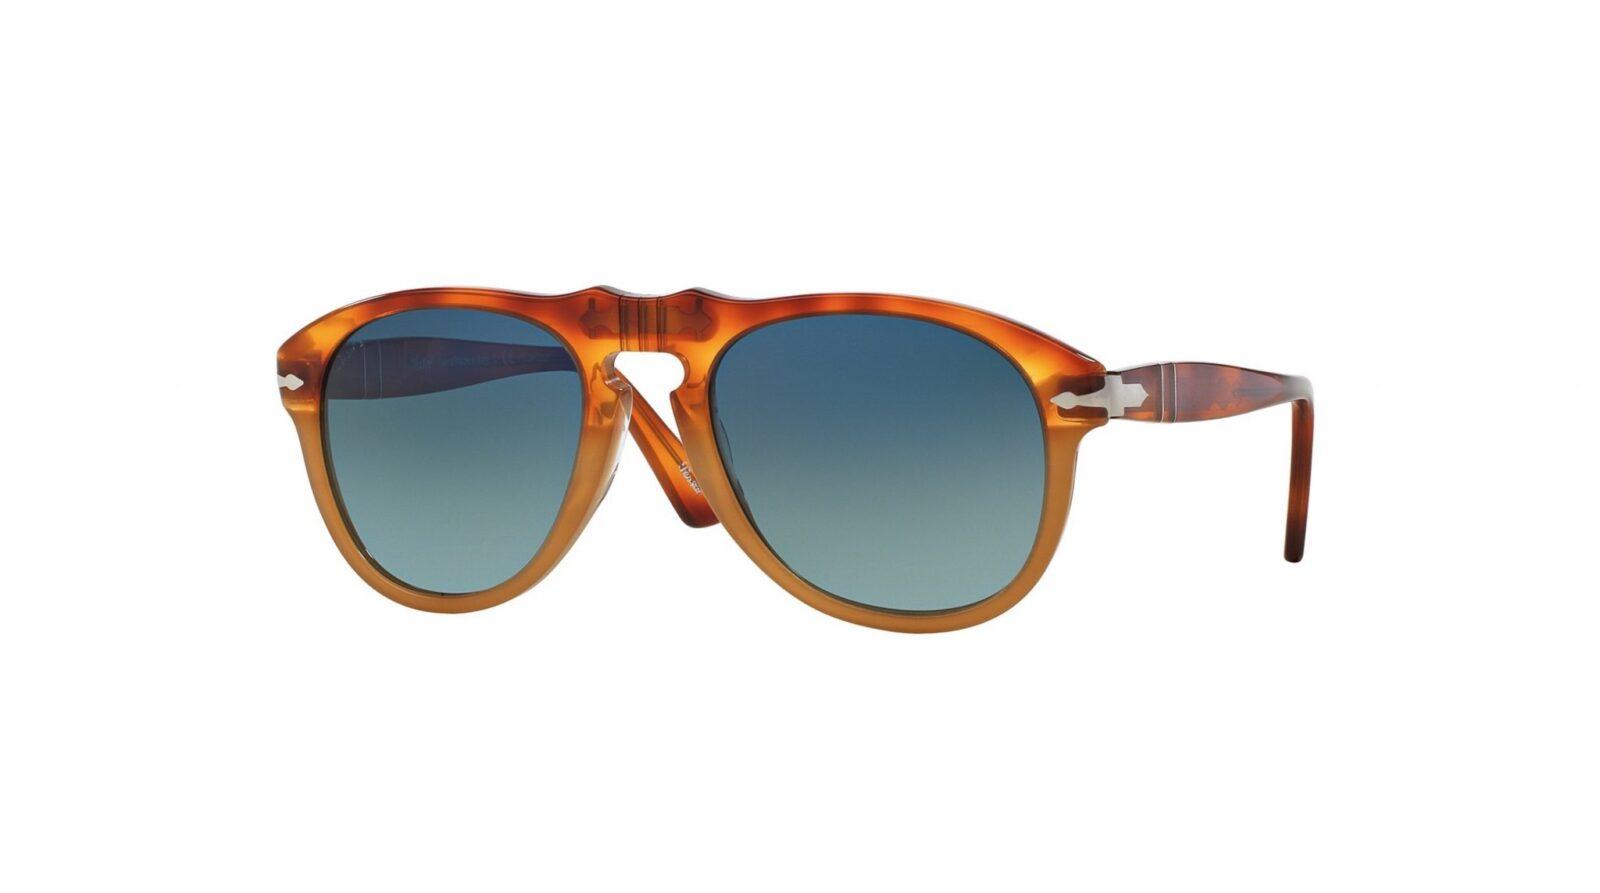 Persol 649 Series Sunglasses 1600x893 - Persol 649 Series Sunglasses